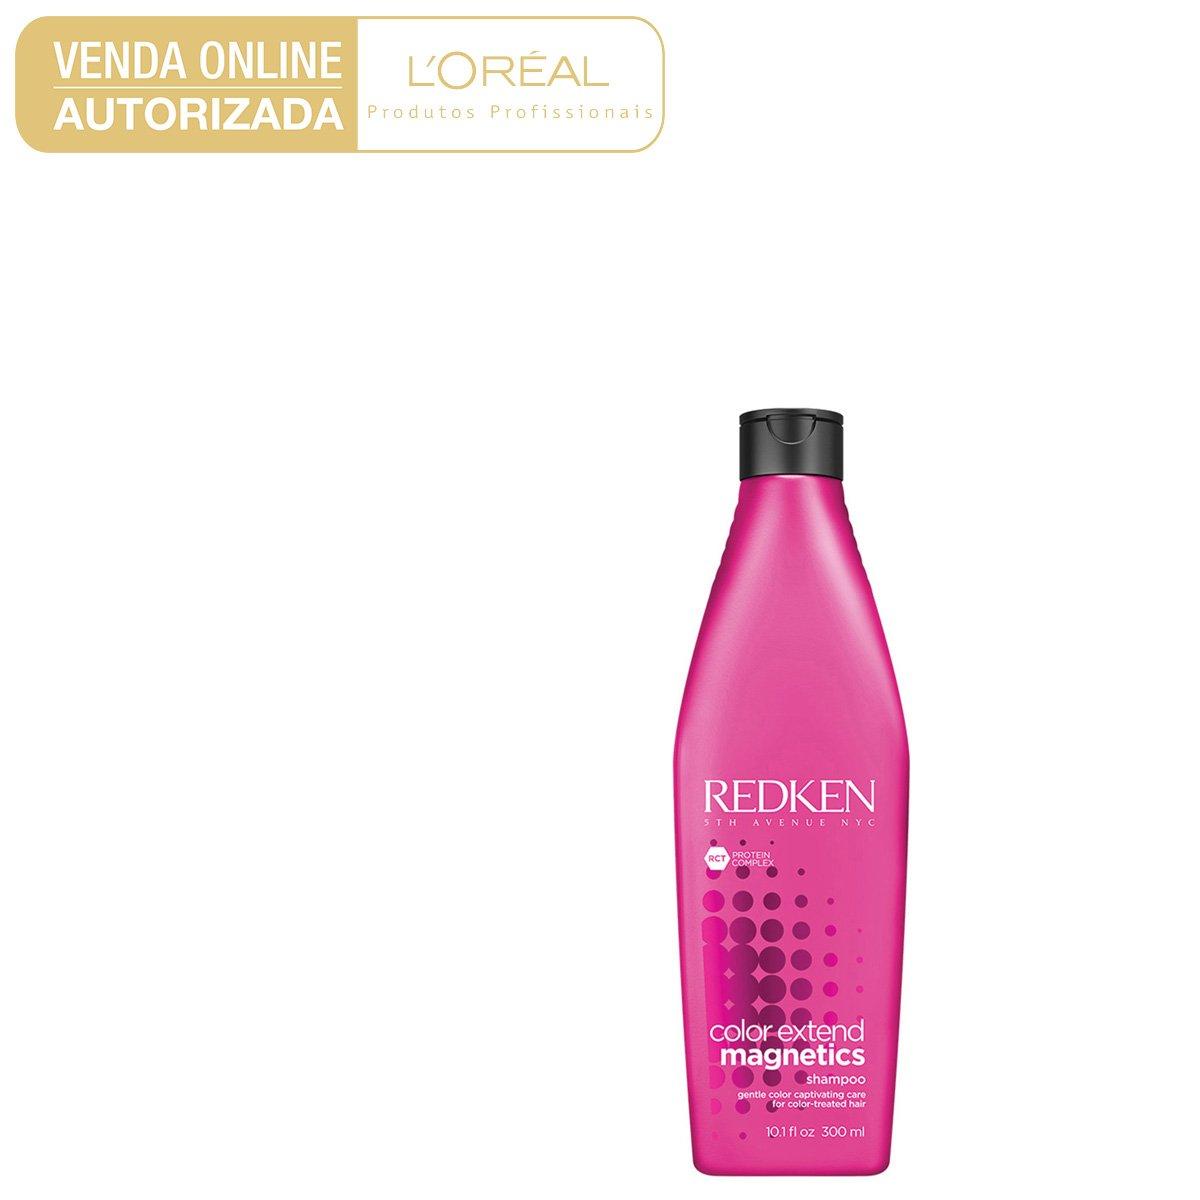 Redken Shampoo Color Extend Magnetics 300ml